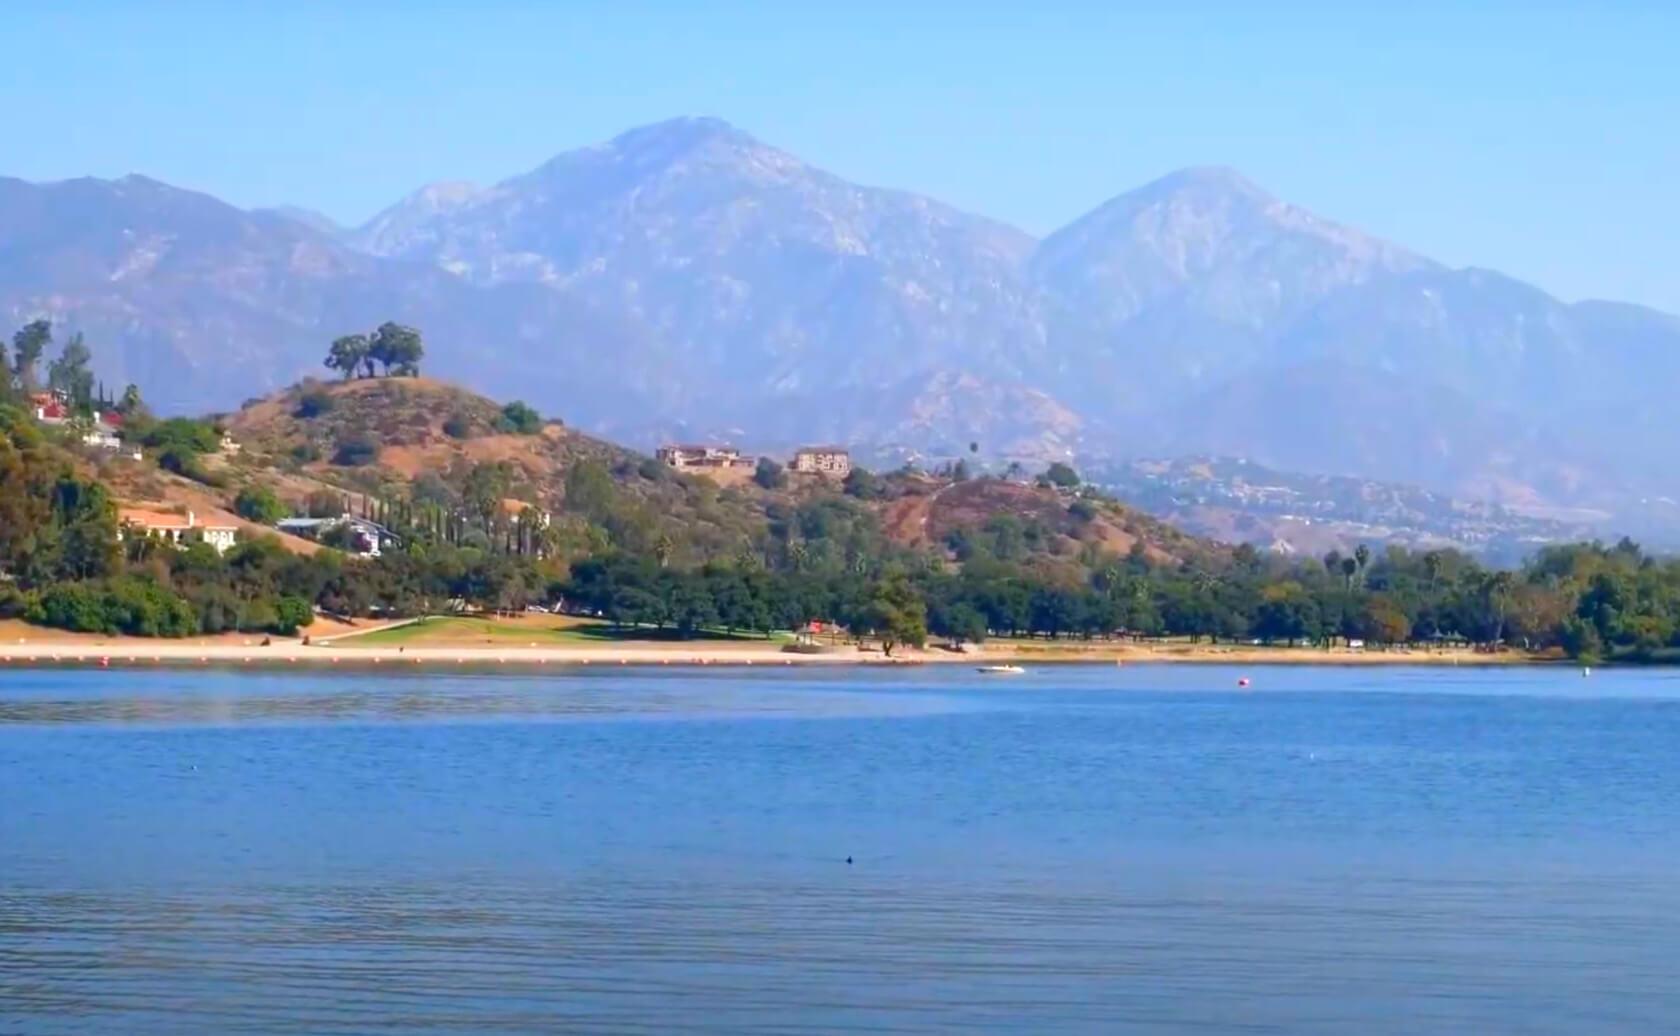 Puddingstone-Lake-Fishing-Guide-Report-California-01